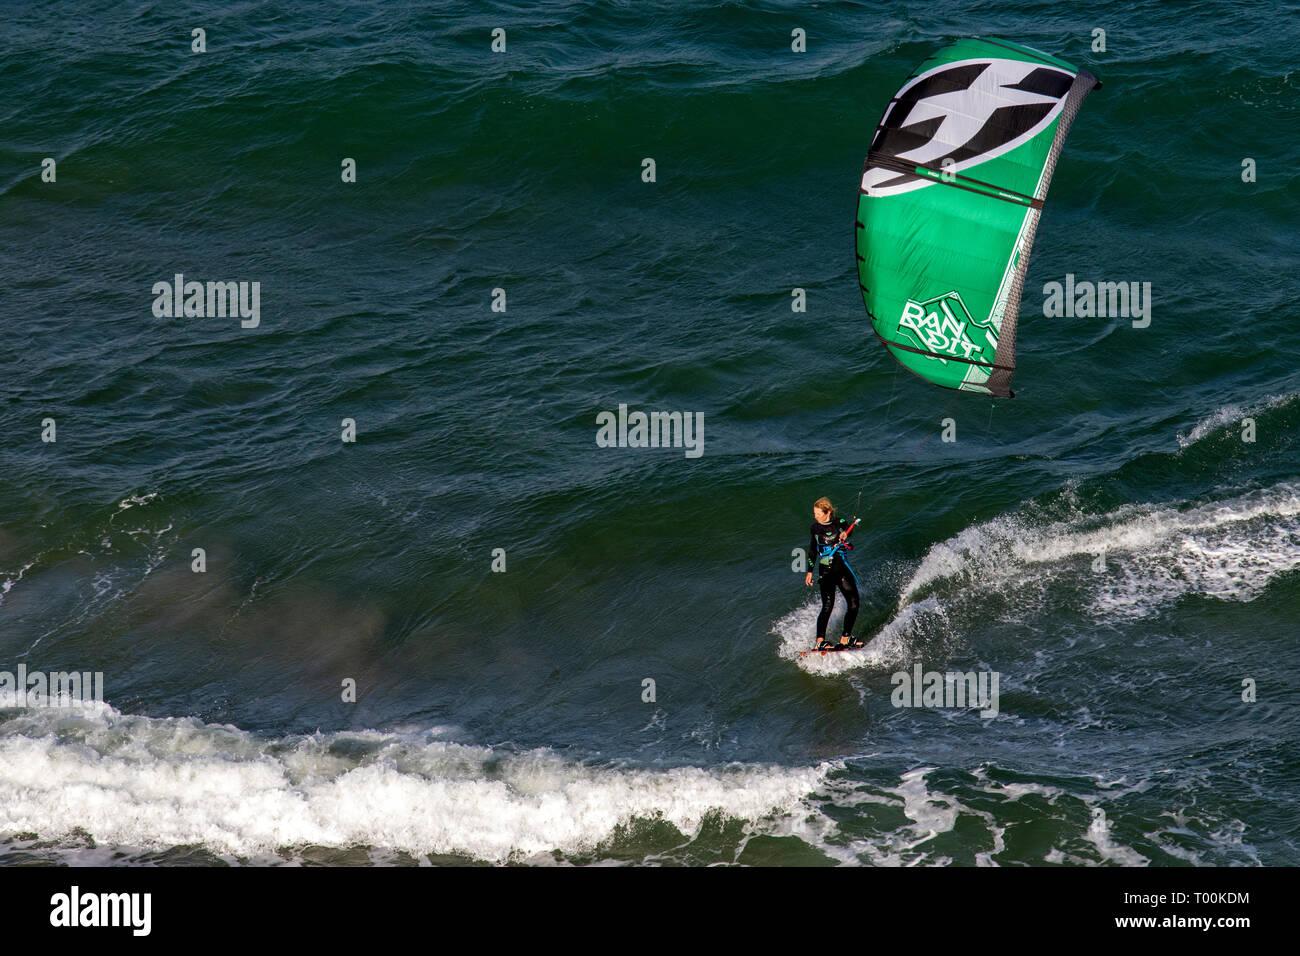 Female Kitesurfer off the coast of Lauderdale-by-the-Sea, Florida, USA - Stock Image